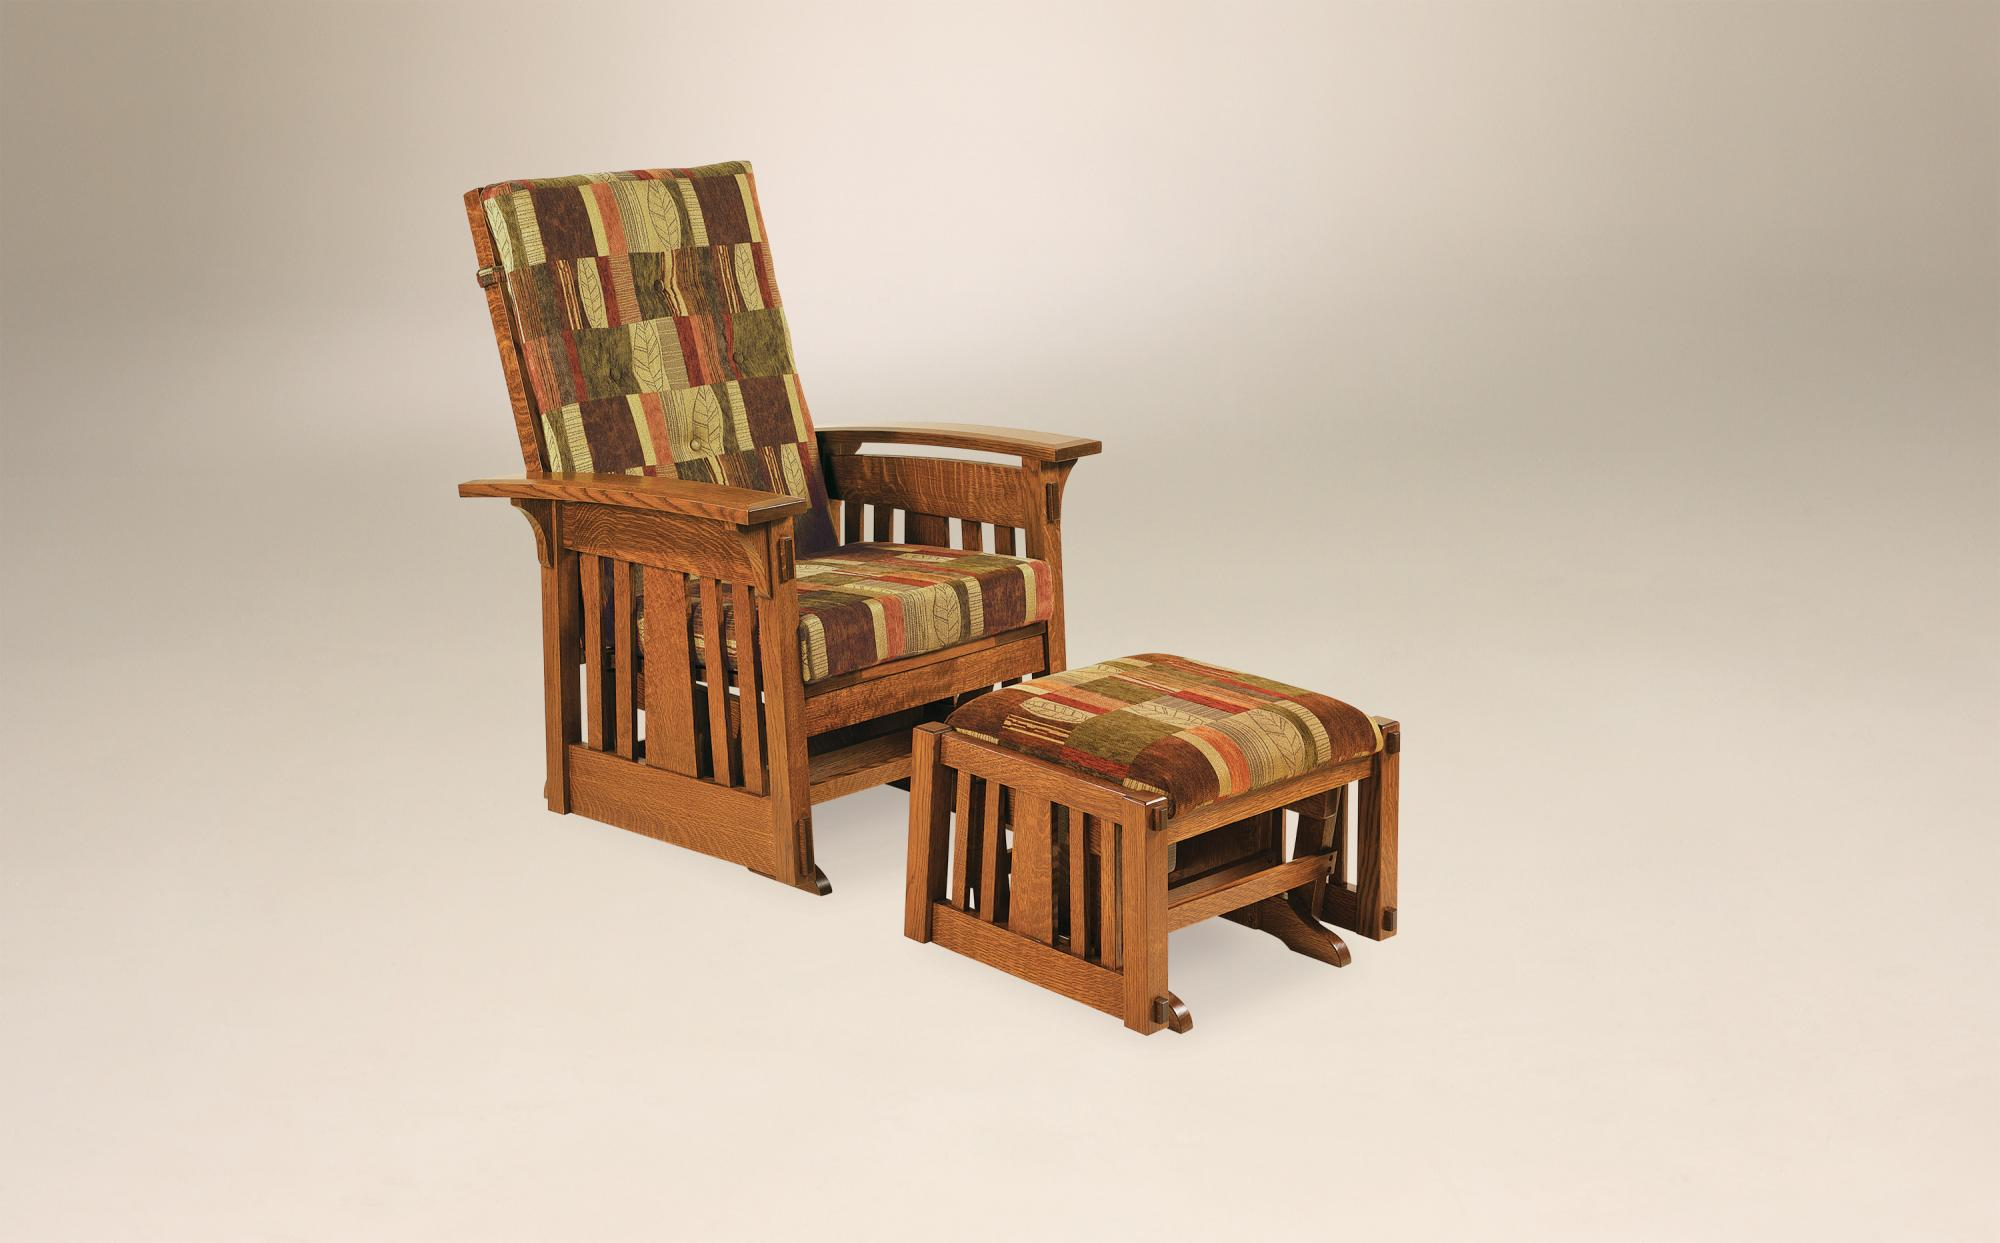 Mccoy Amish Furniture Store Mankato Mn